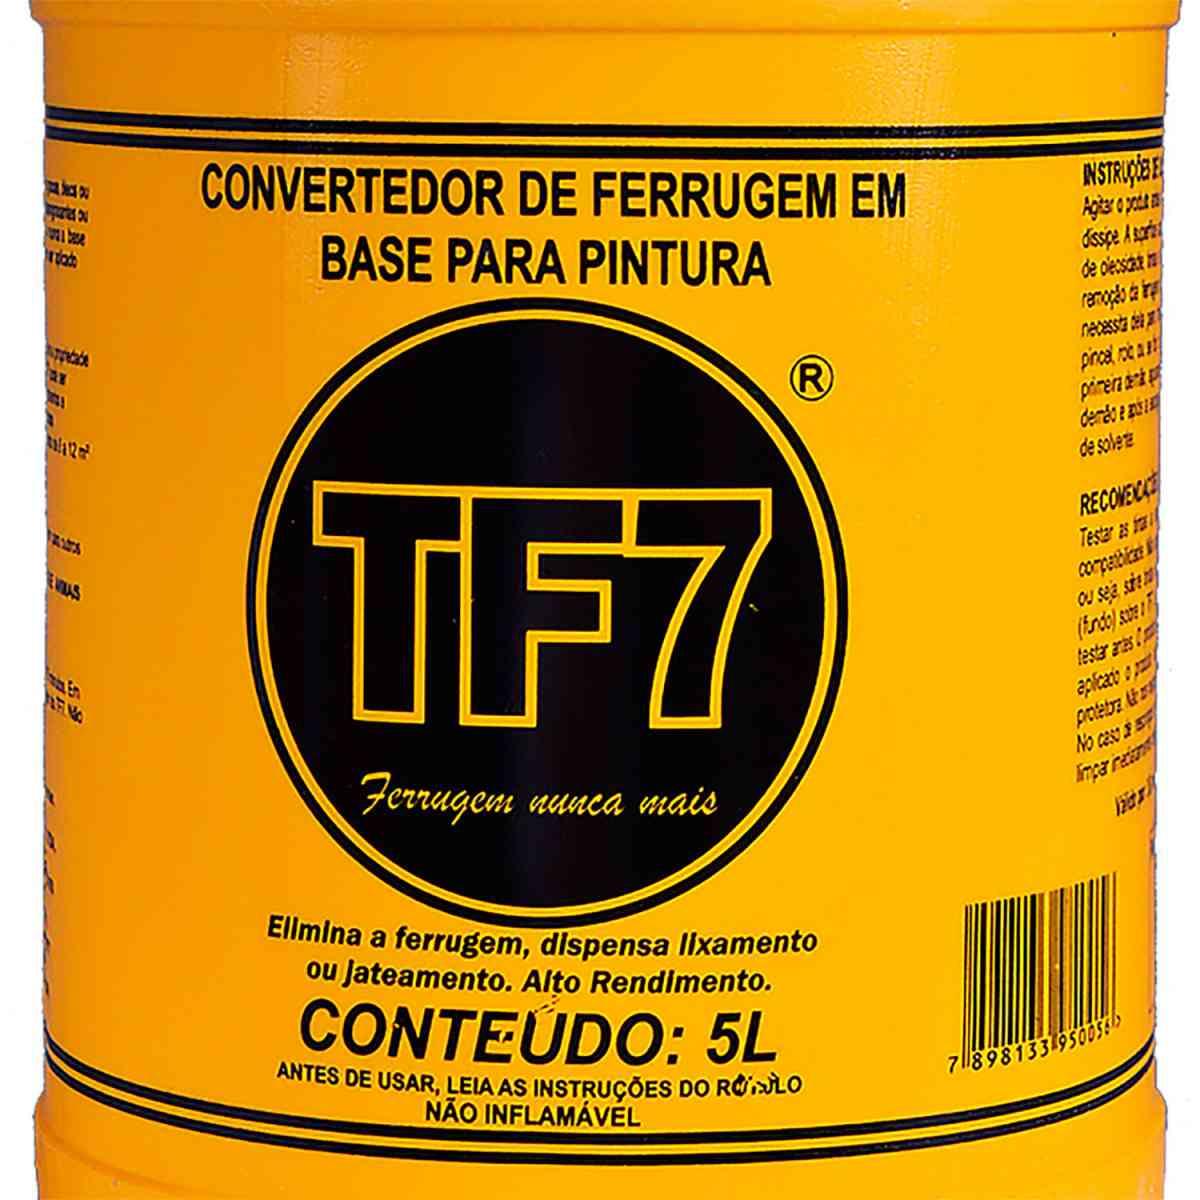 Convertedor de Ferrugem CF-TF7 5 Litros TF7